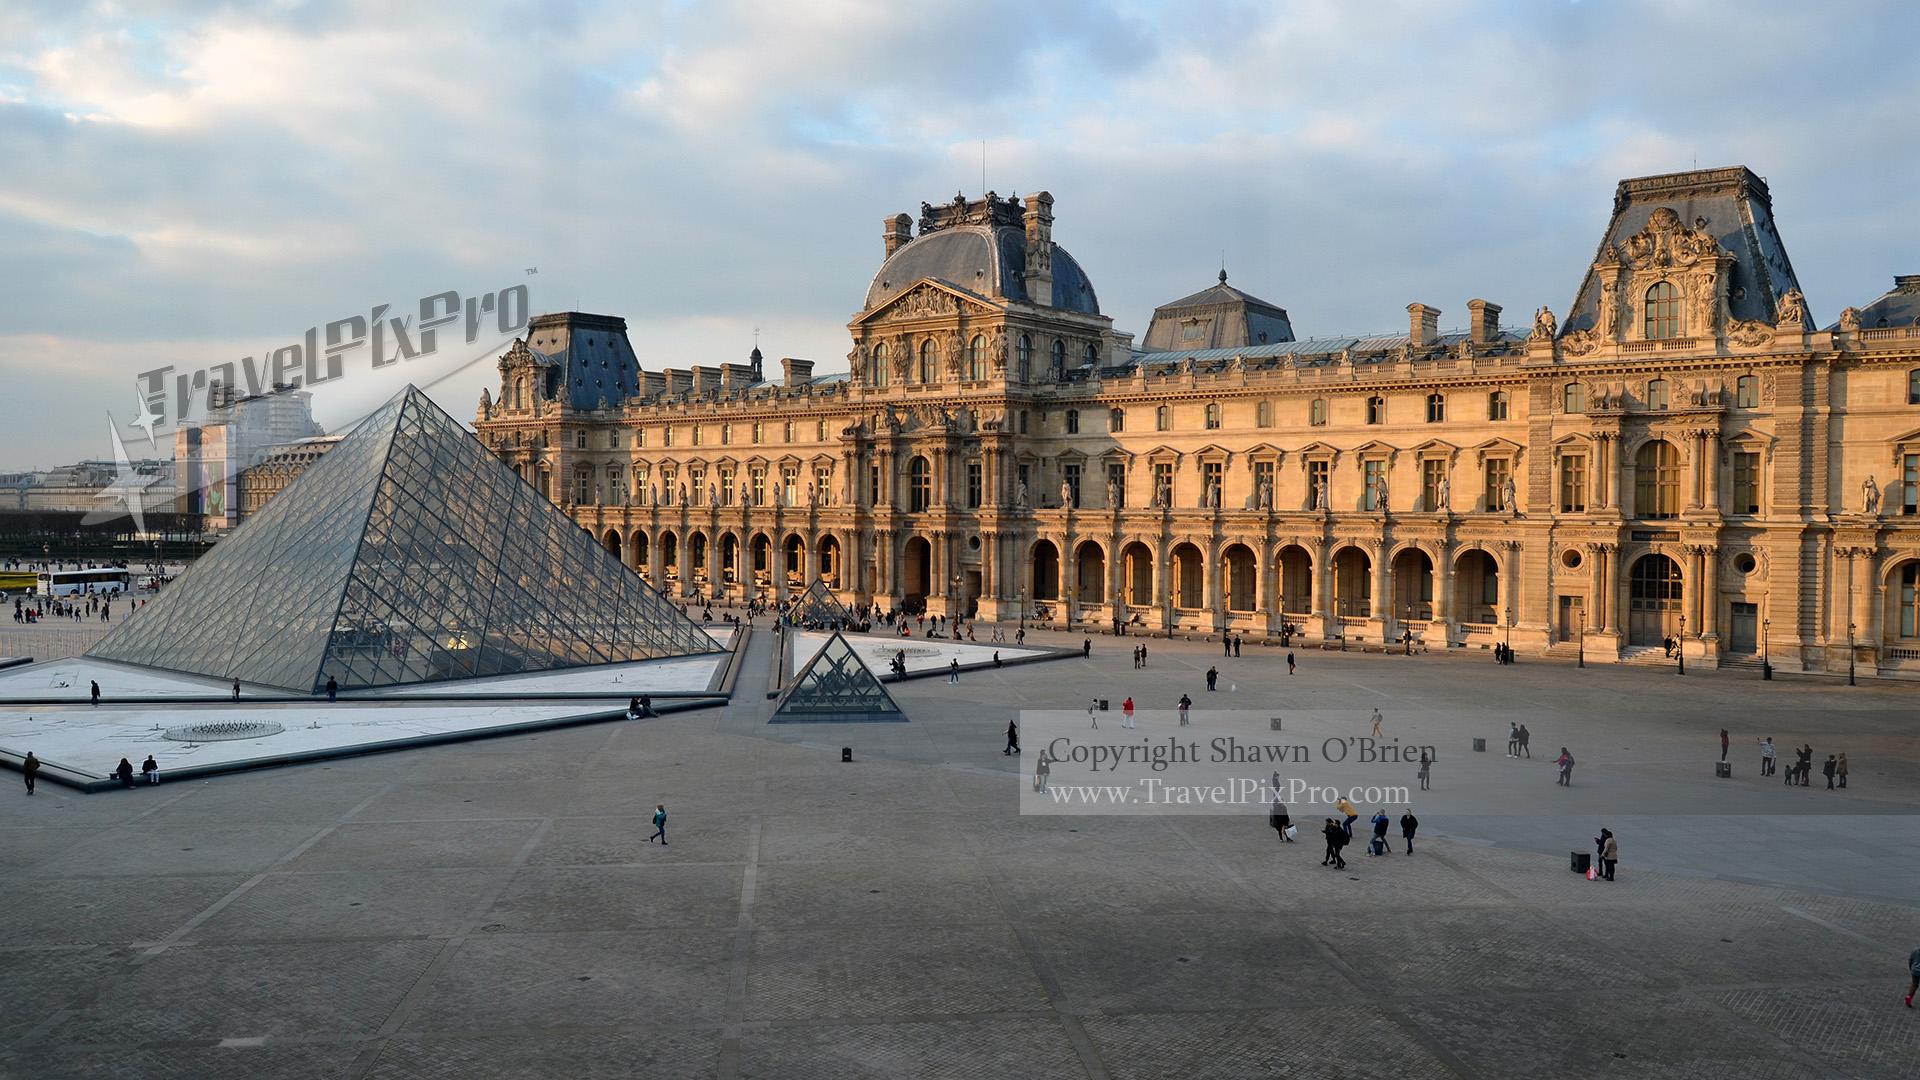 Paris' Louvre Palace & Pyramids